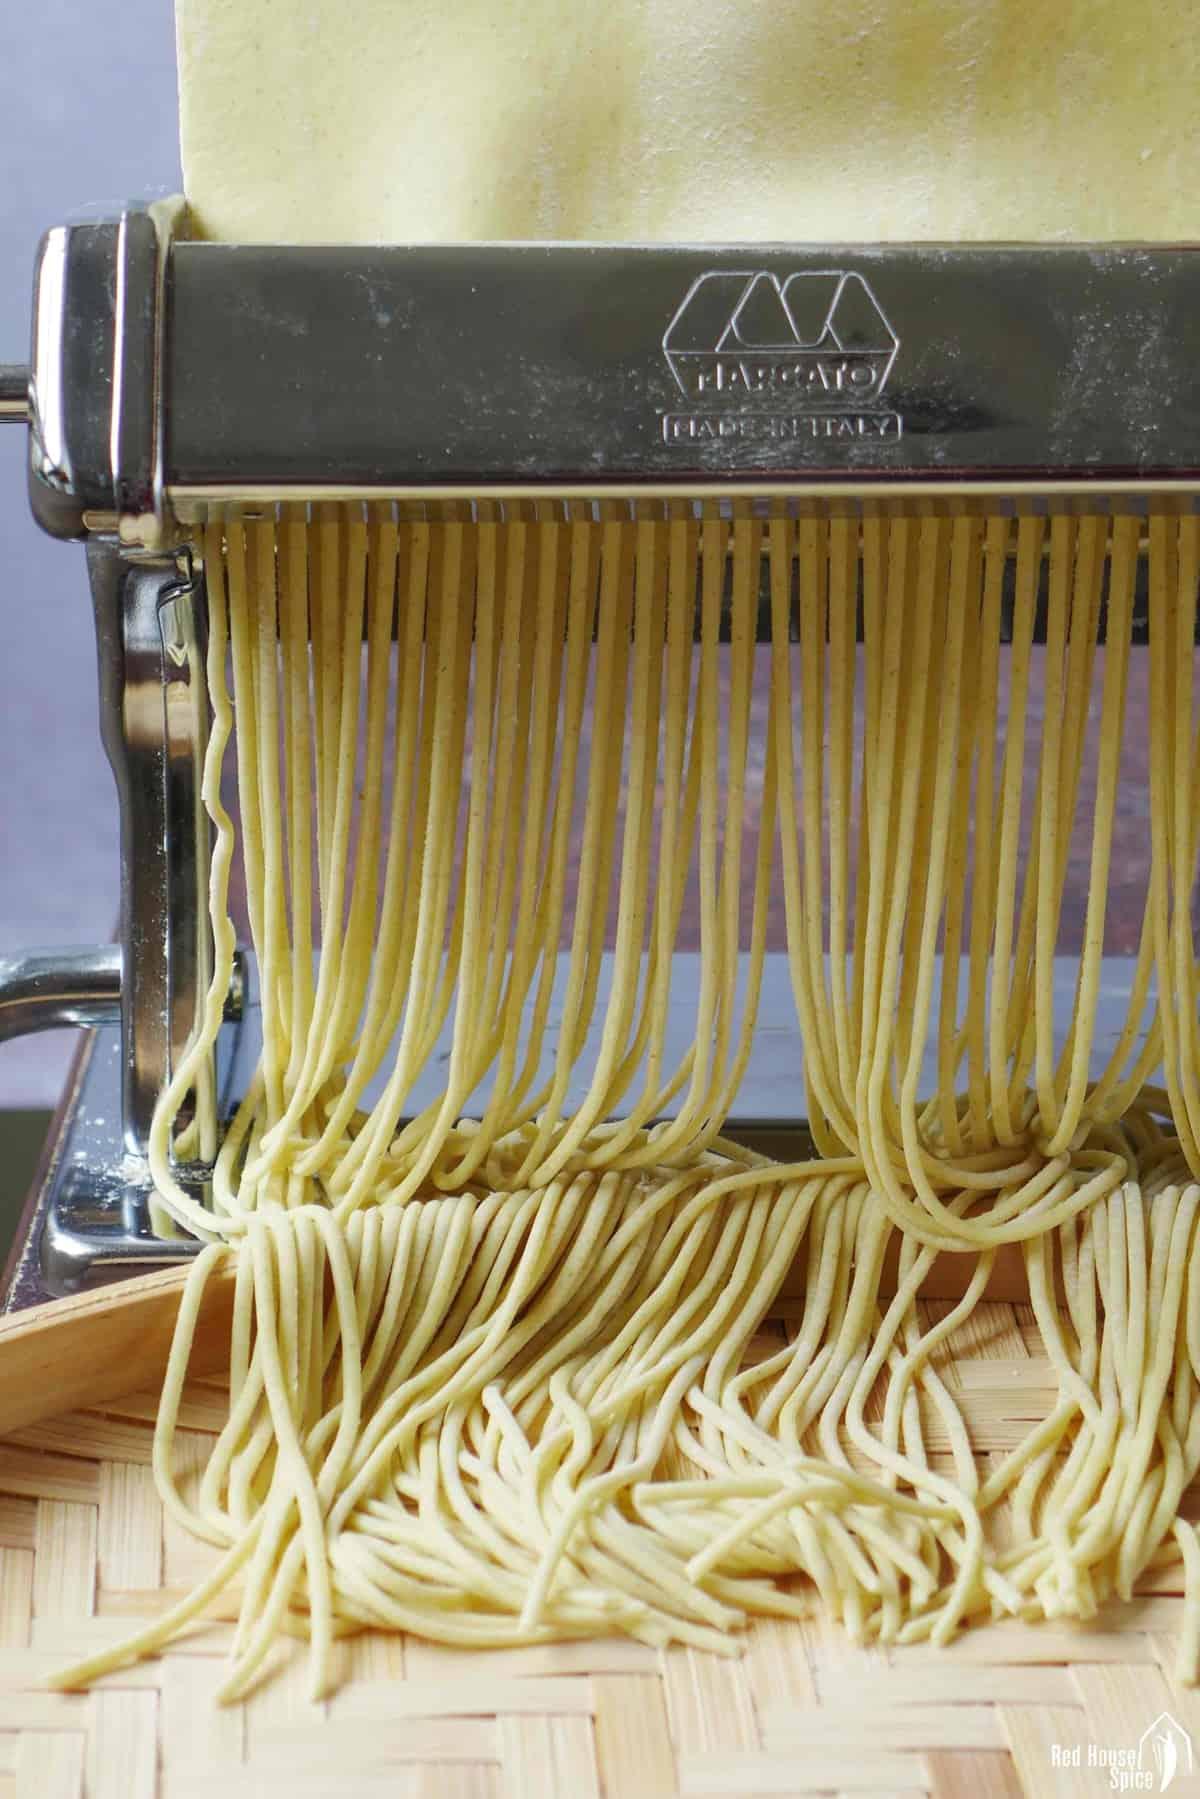 Cutting dough sheet into round noodles through a pasta cutter